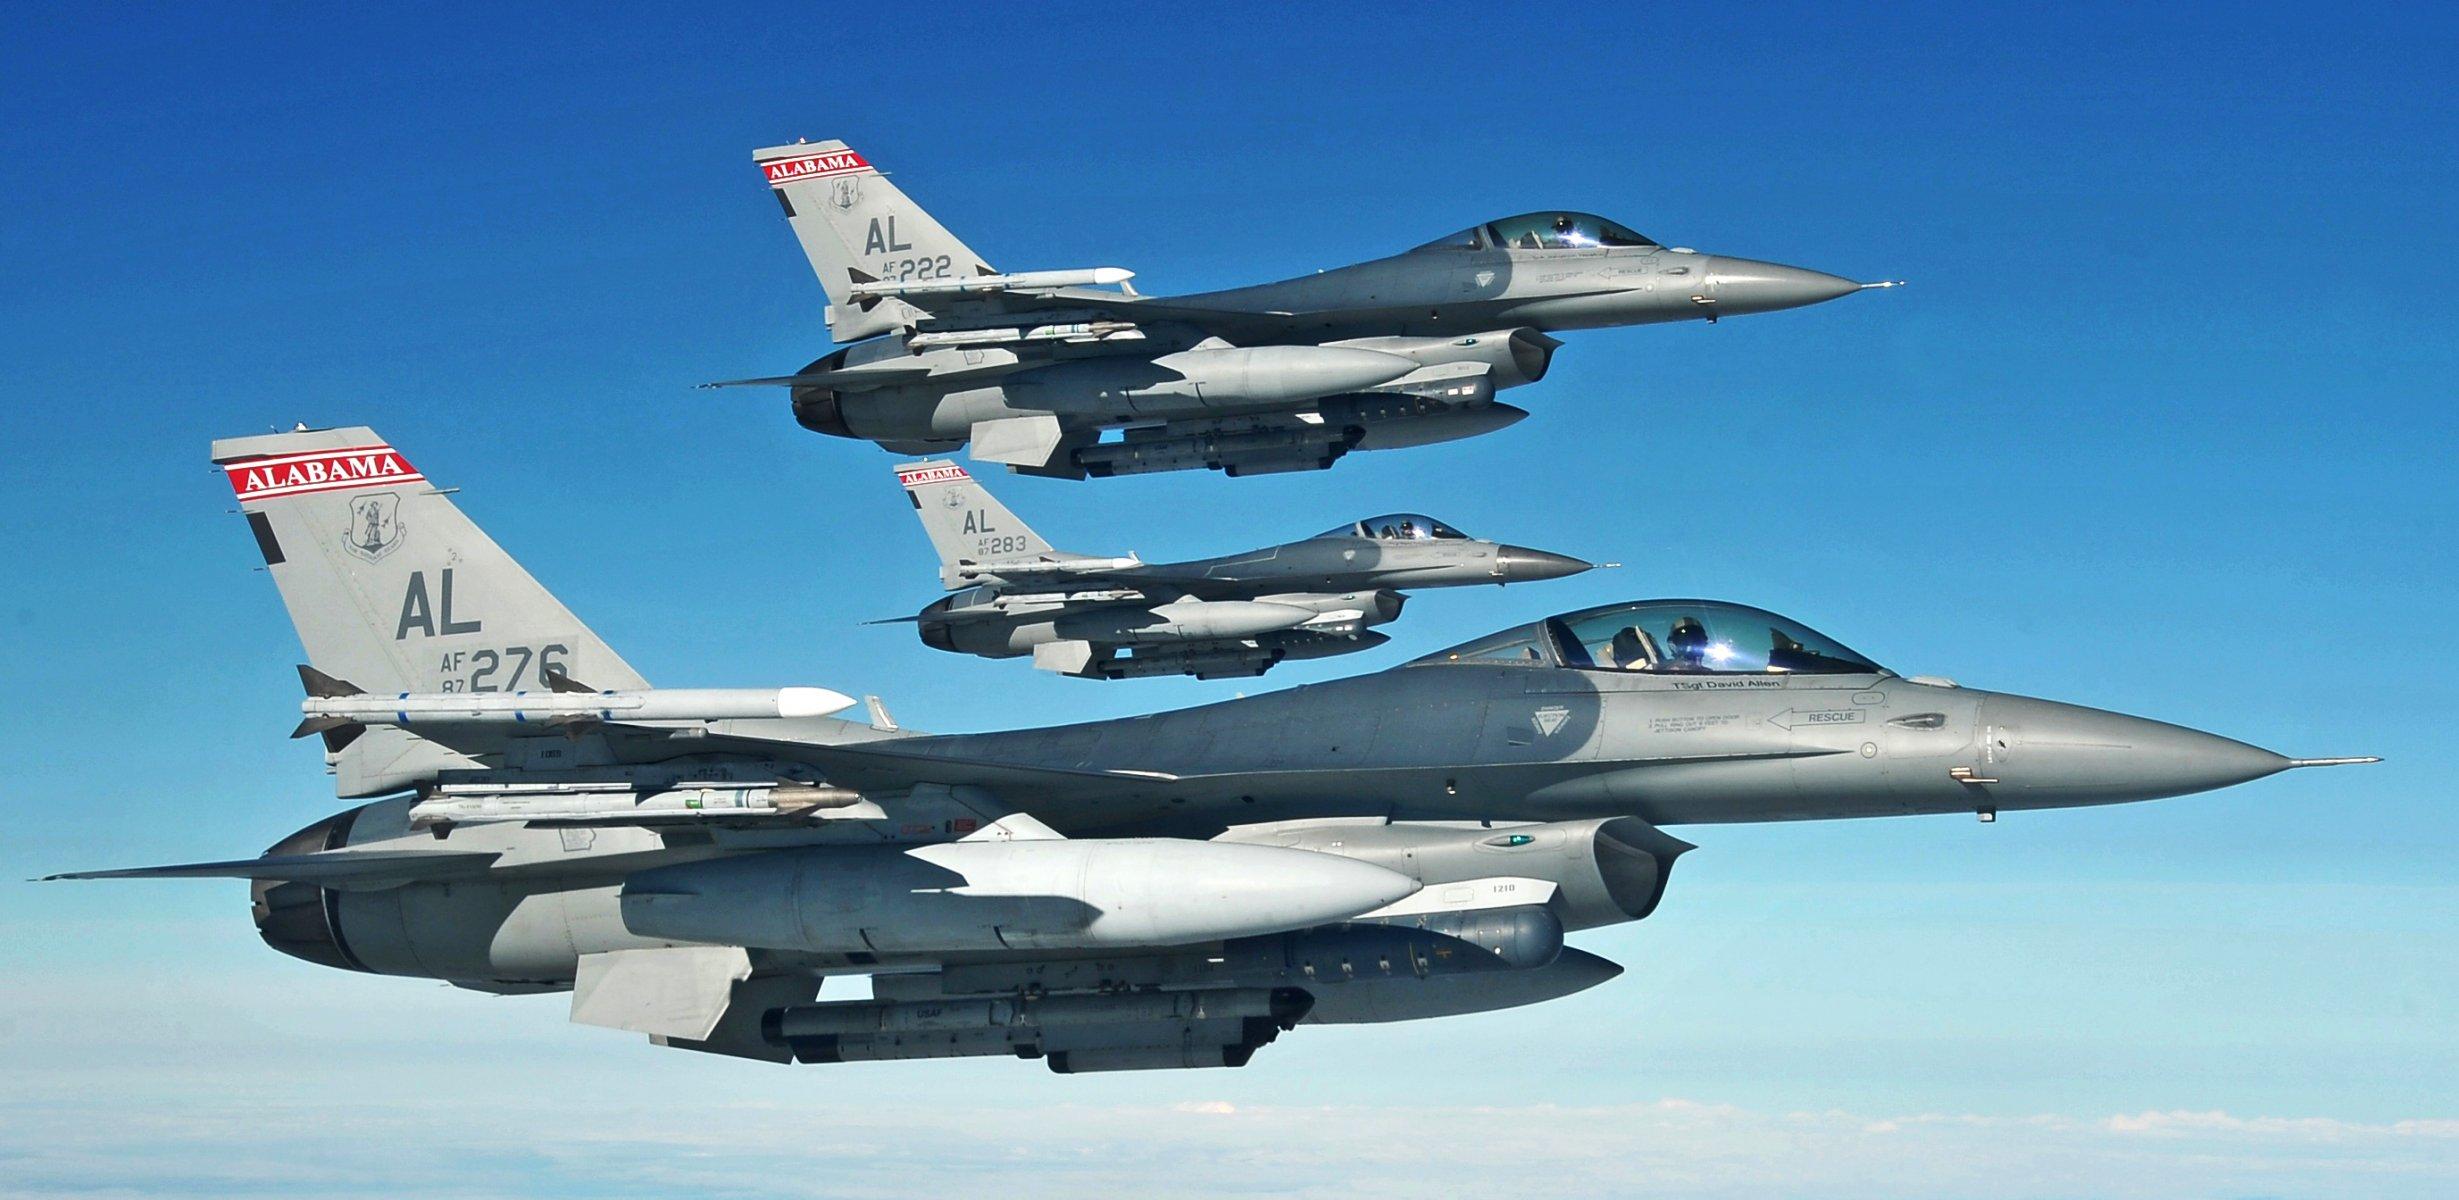 Обои fighting falcon, general dynamics, истребитель. Авиация foto 19